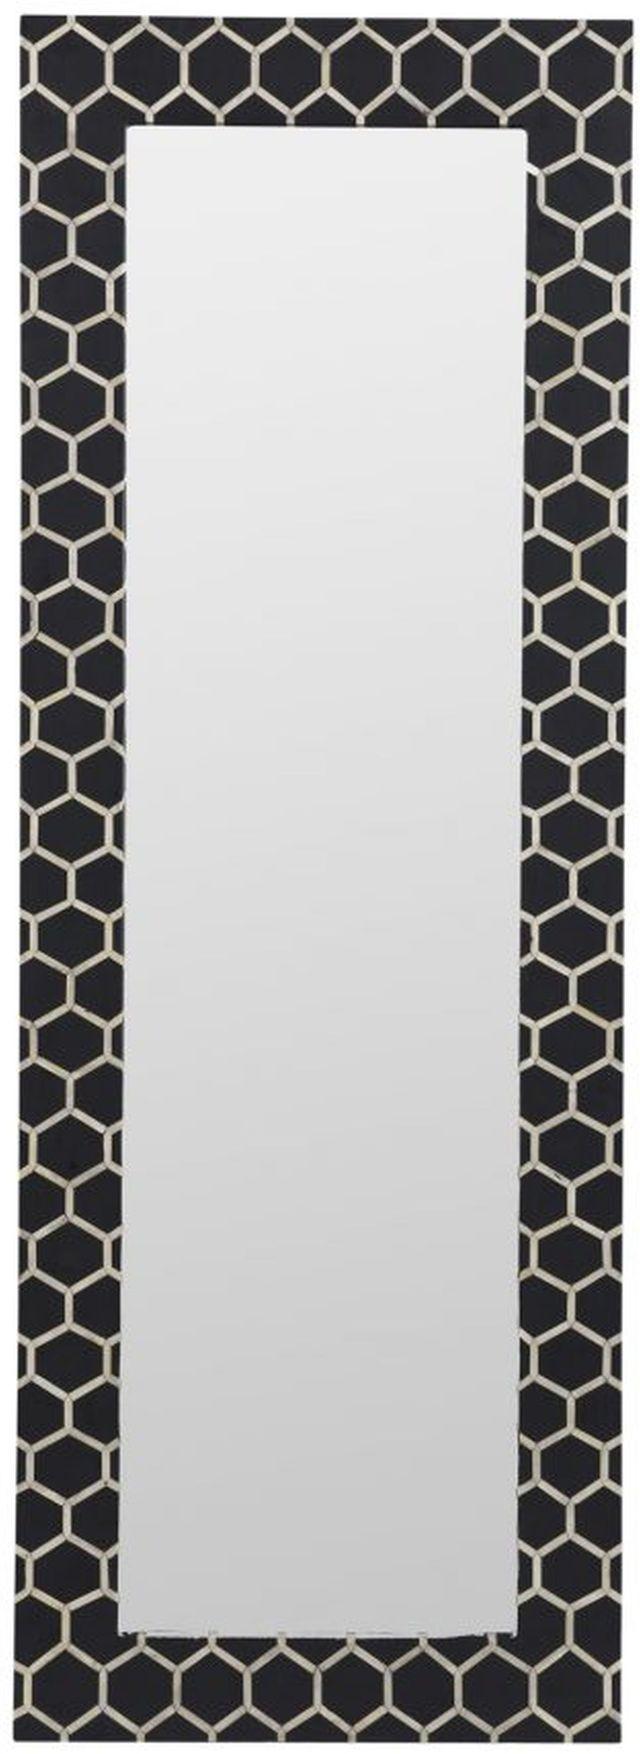 Moe's Home Collections Sosa Mirror-PJ-1017-37